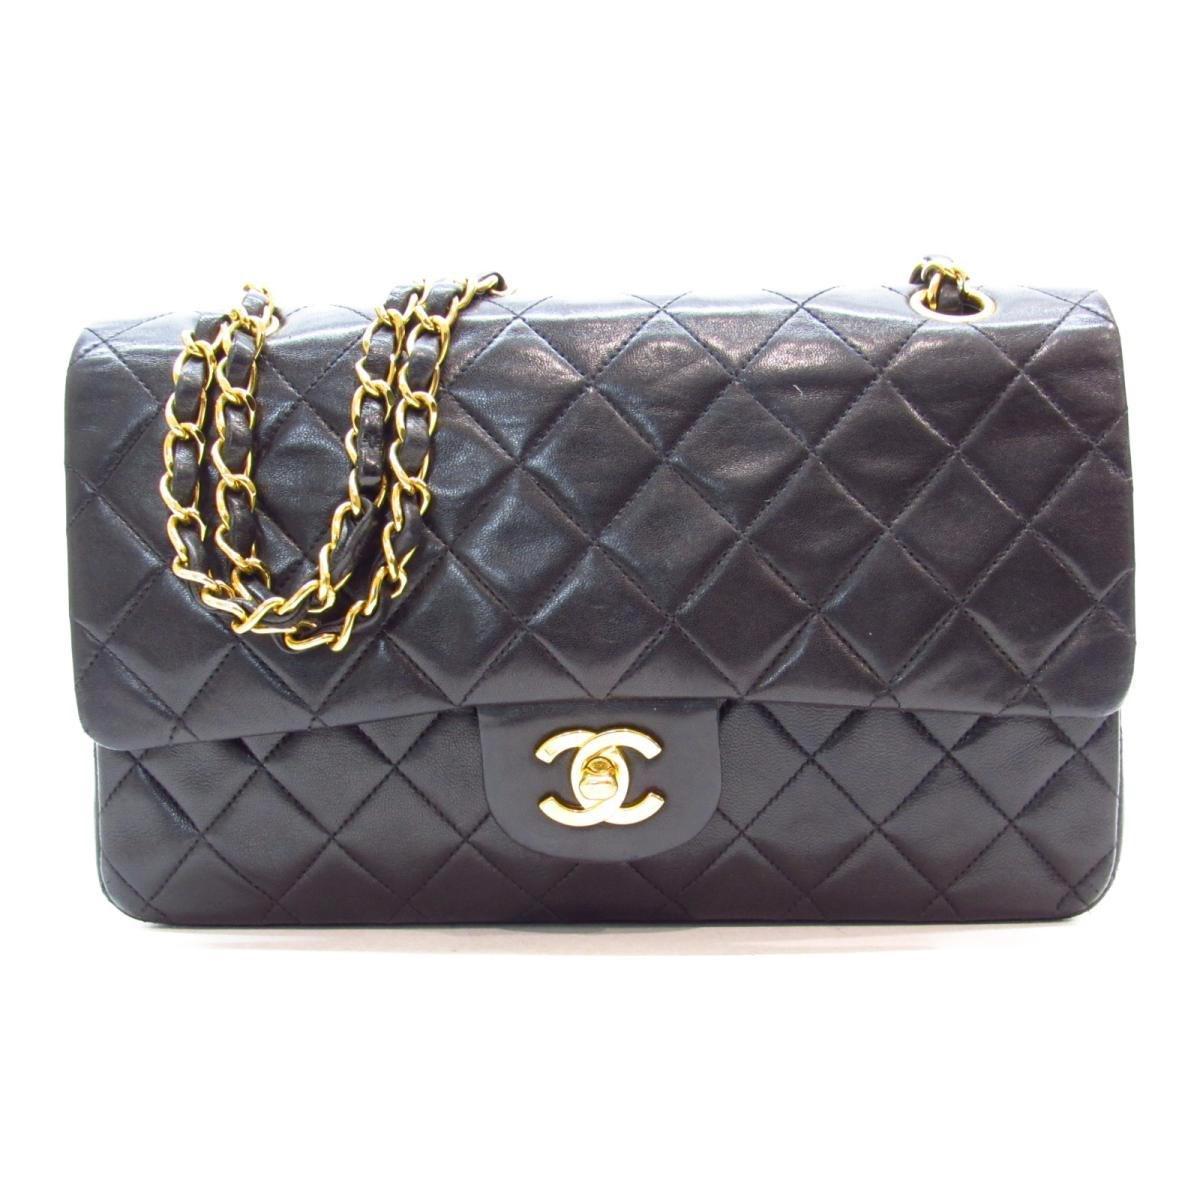 3719200336c Lyst - Chanel Authentic Matelasse W Flap Chain Shoulder Bag Lambskin ...